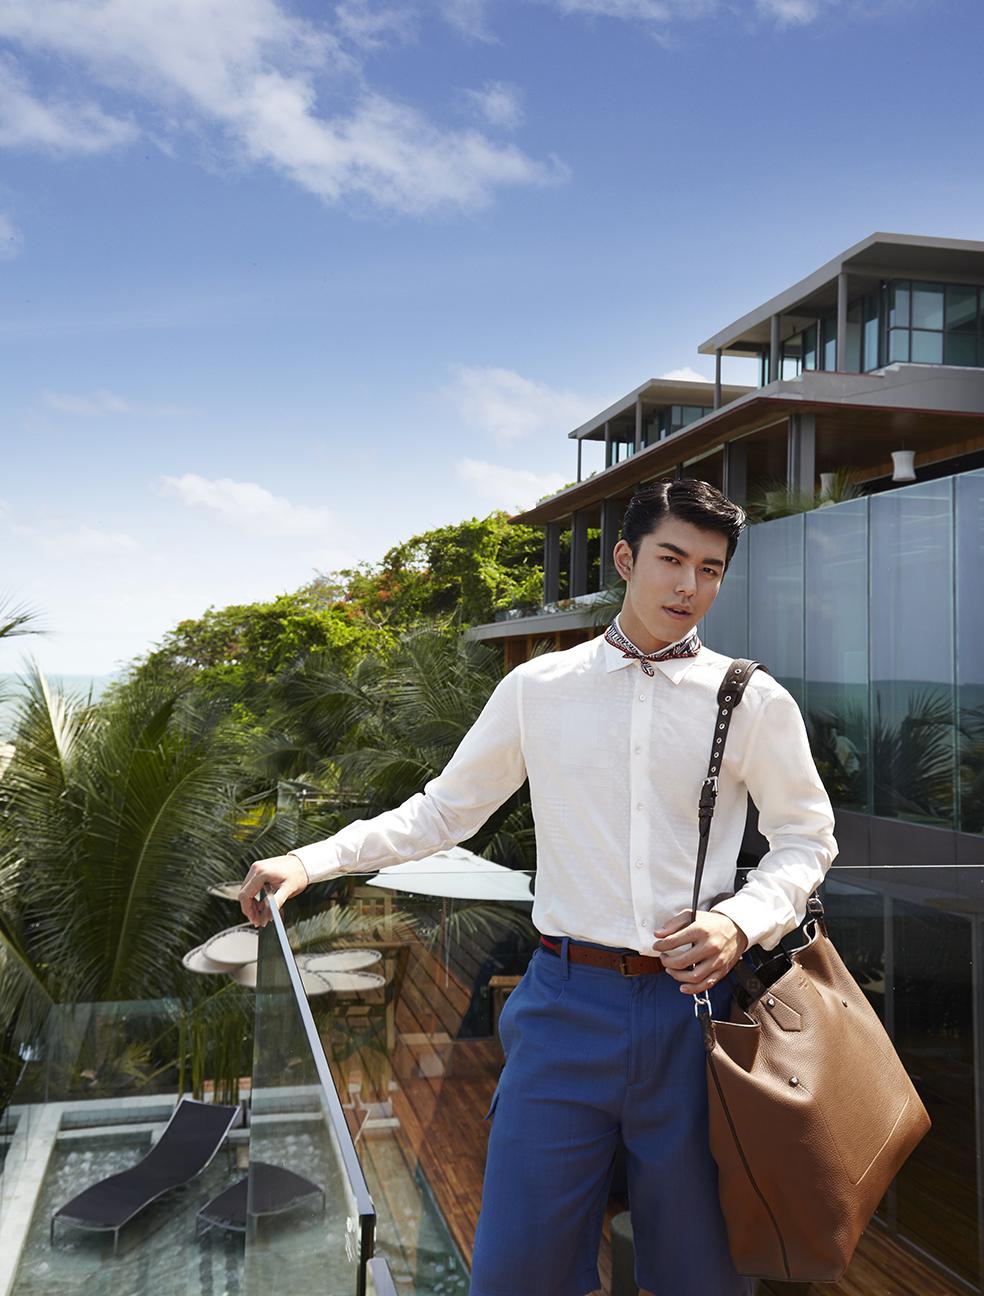 Clothes and Bag : Louis Vuitton